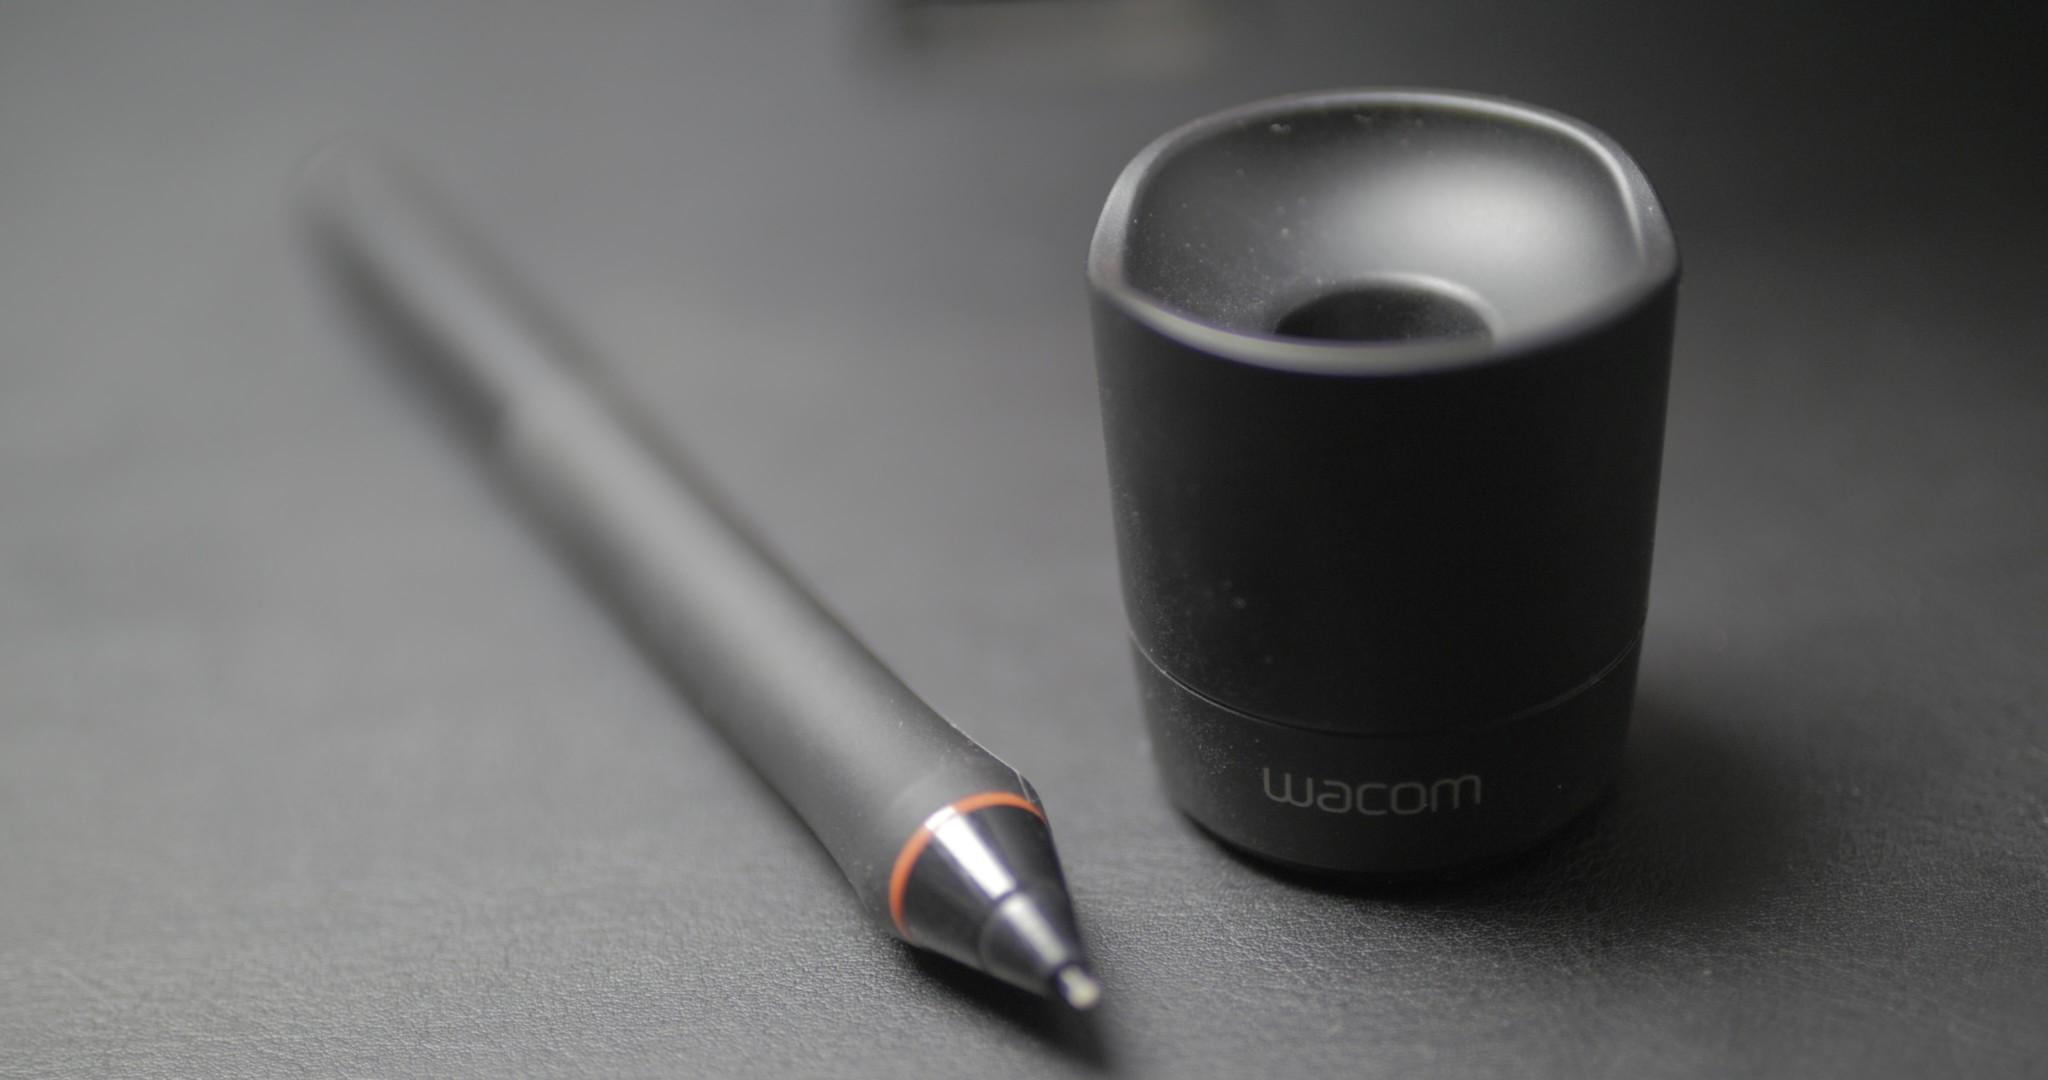 Fix WACOM Pen Lag On Windows - Ultimate Brush Performance